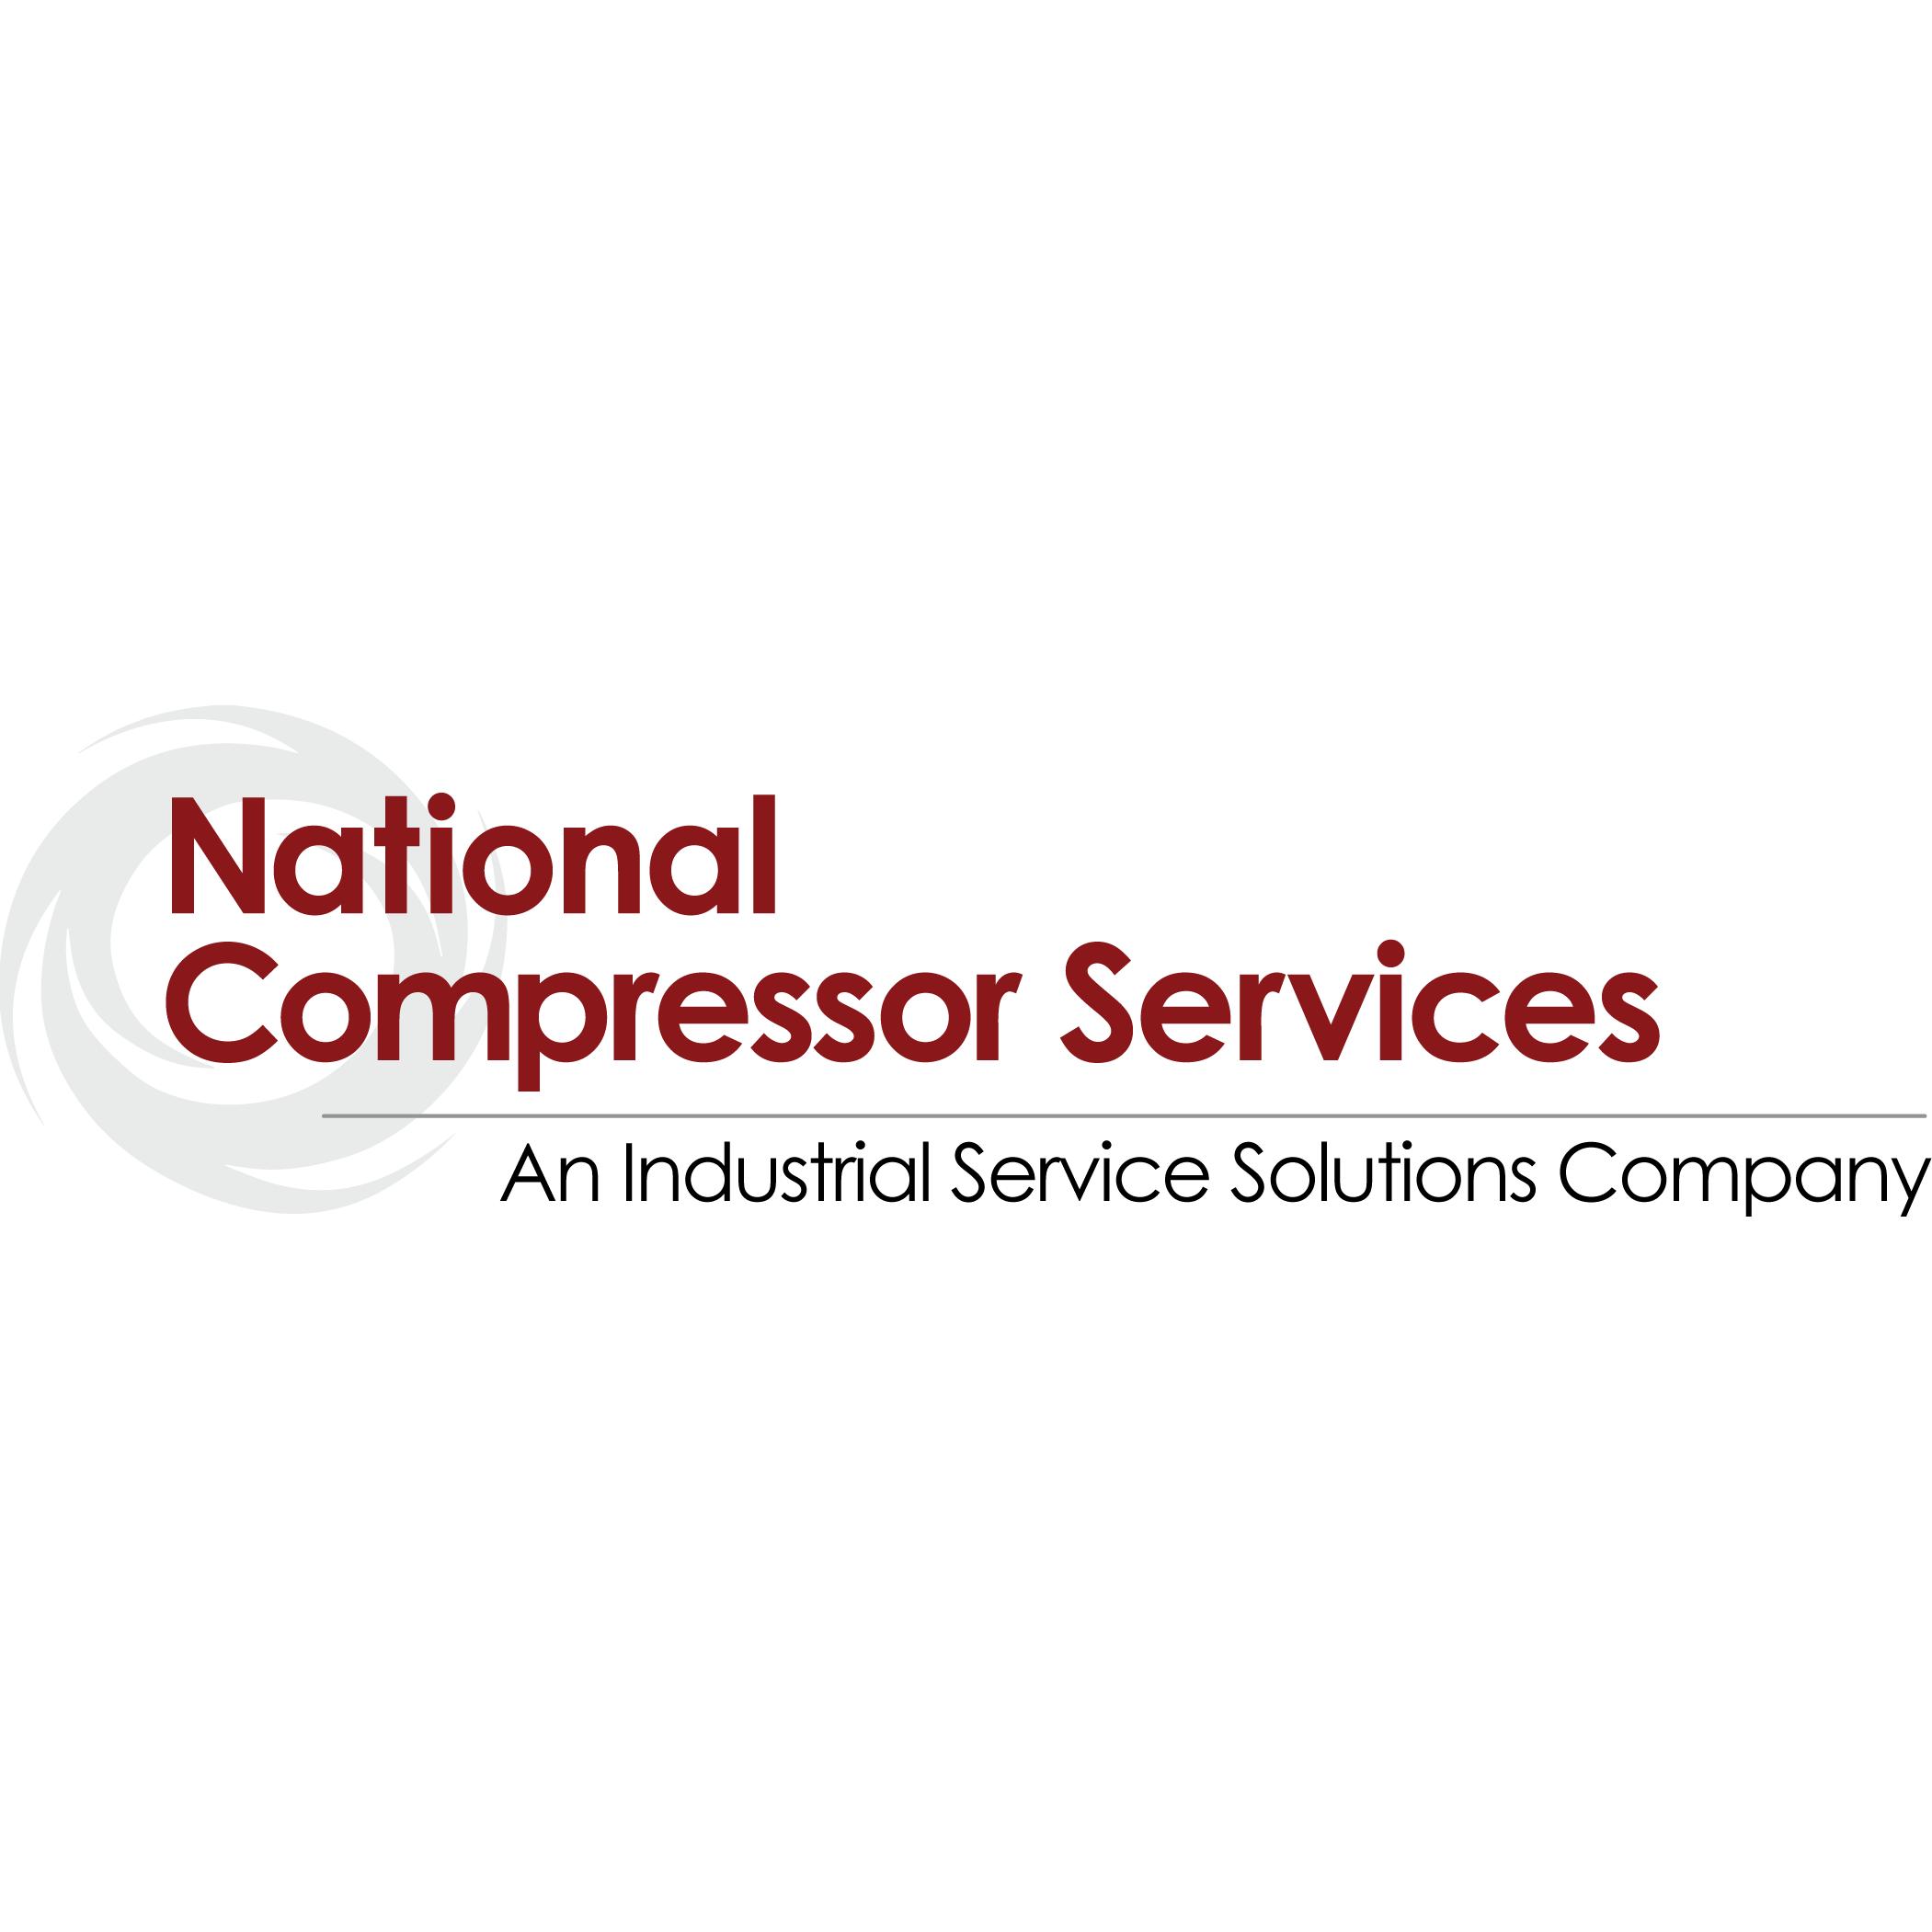 National Compressor Services